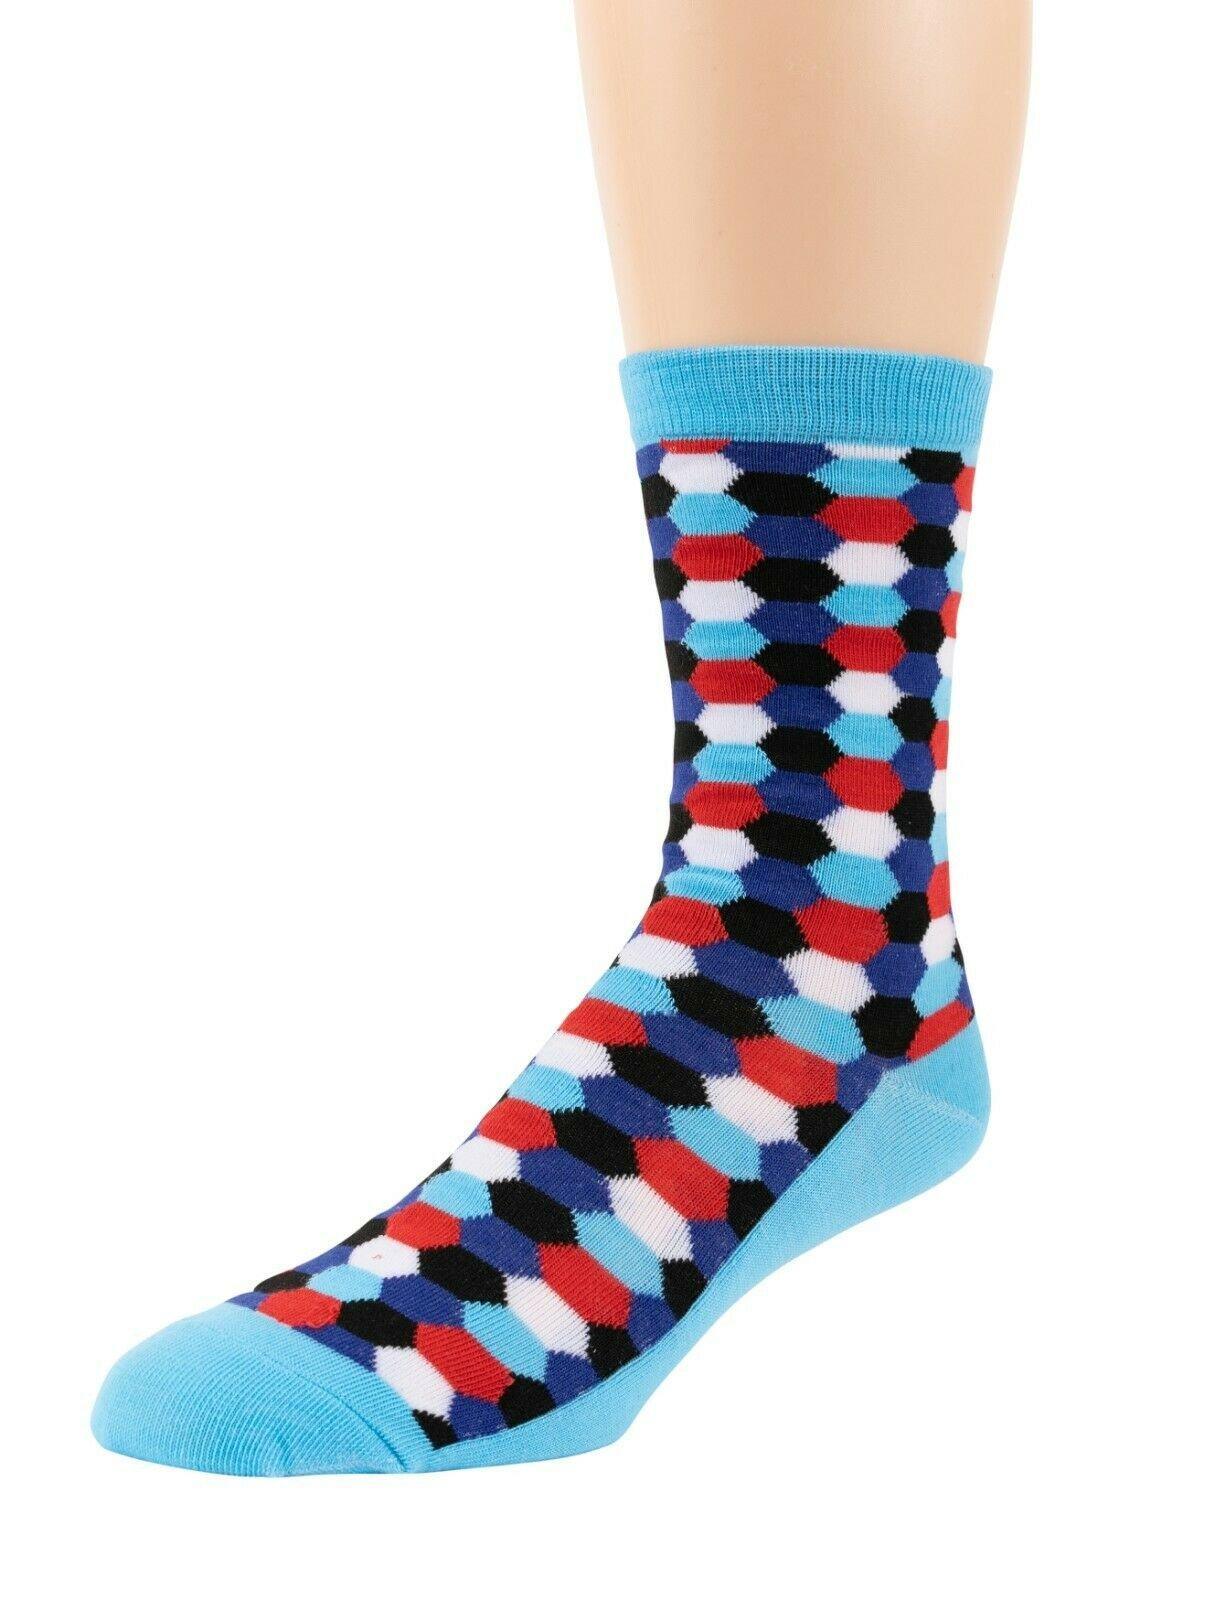 Mitch-Bogen-Mens-Cotton-Dress-Socks-Colorful-Fashion-Crew-Socks-8-Pack-Gift-Box thumbnail 66